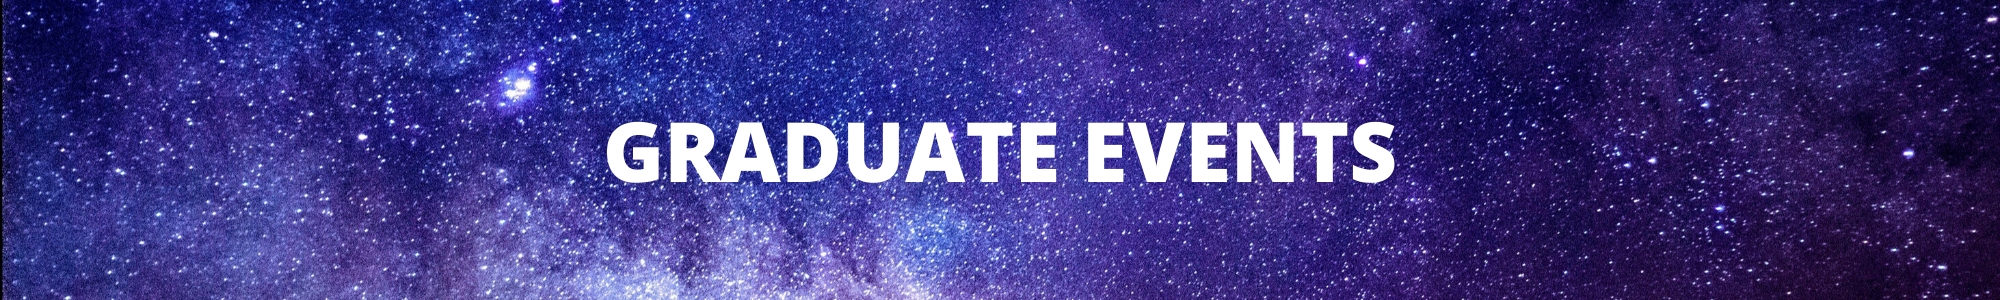 Graduate Events